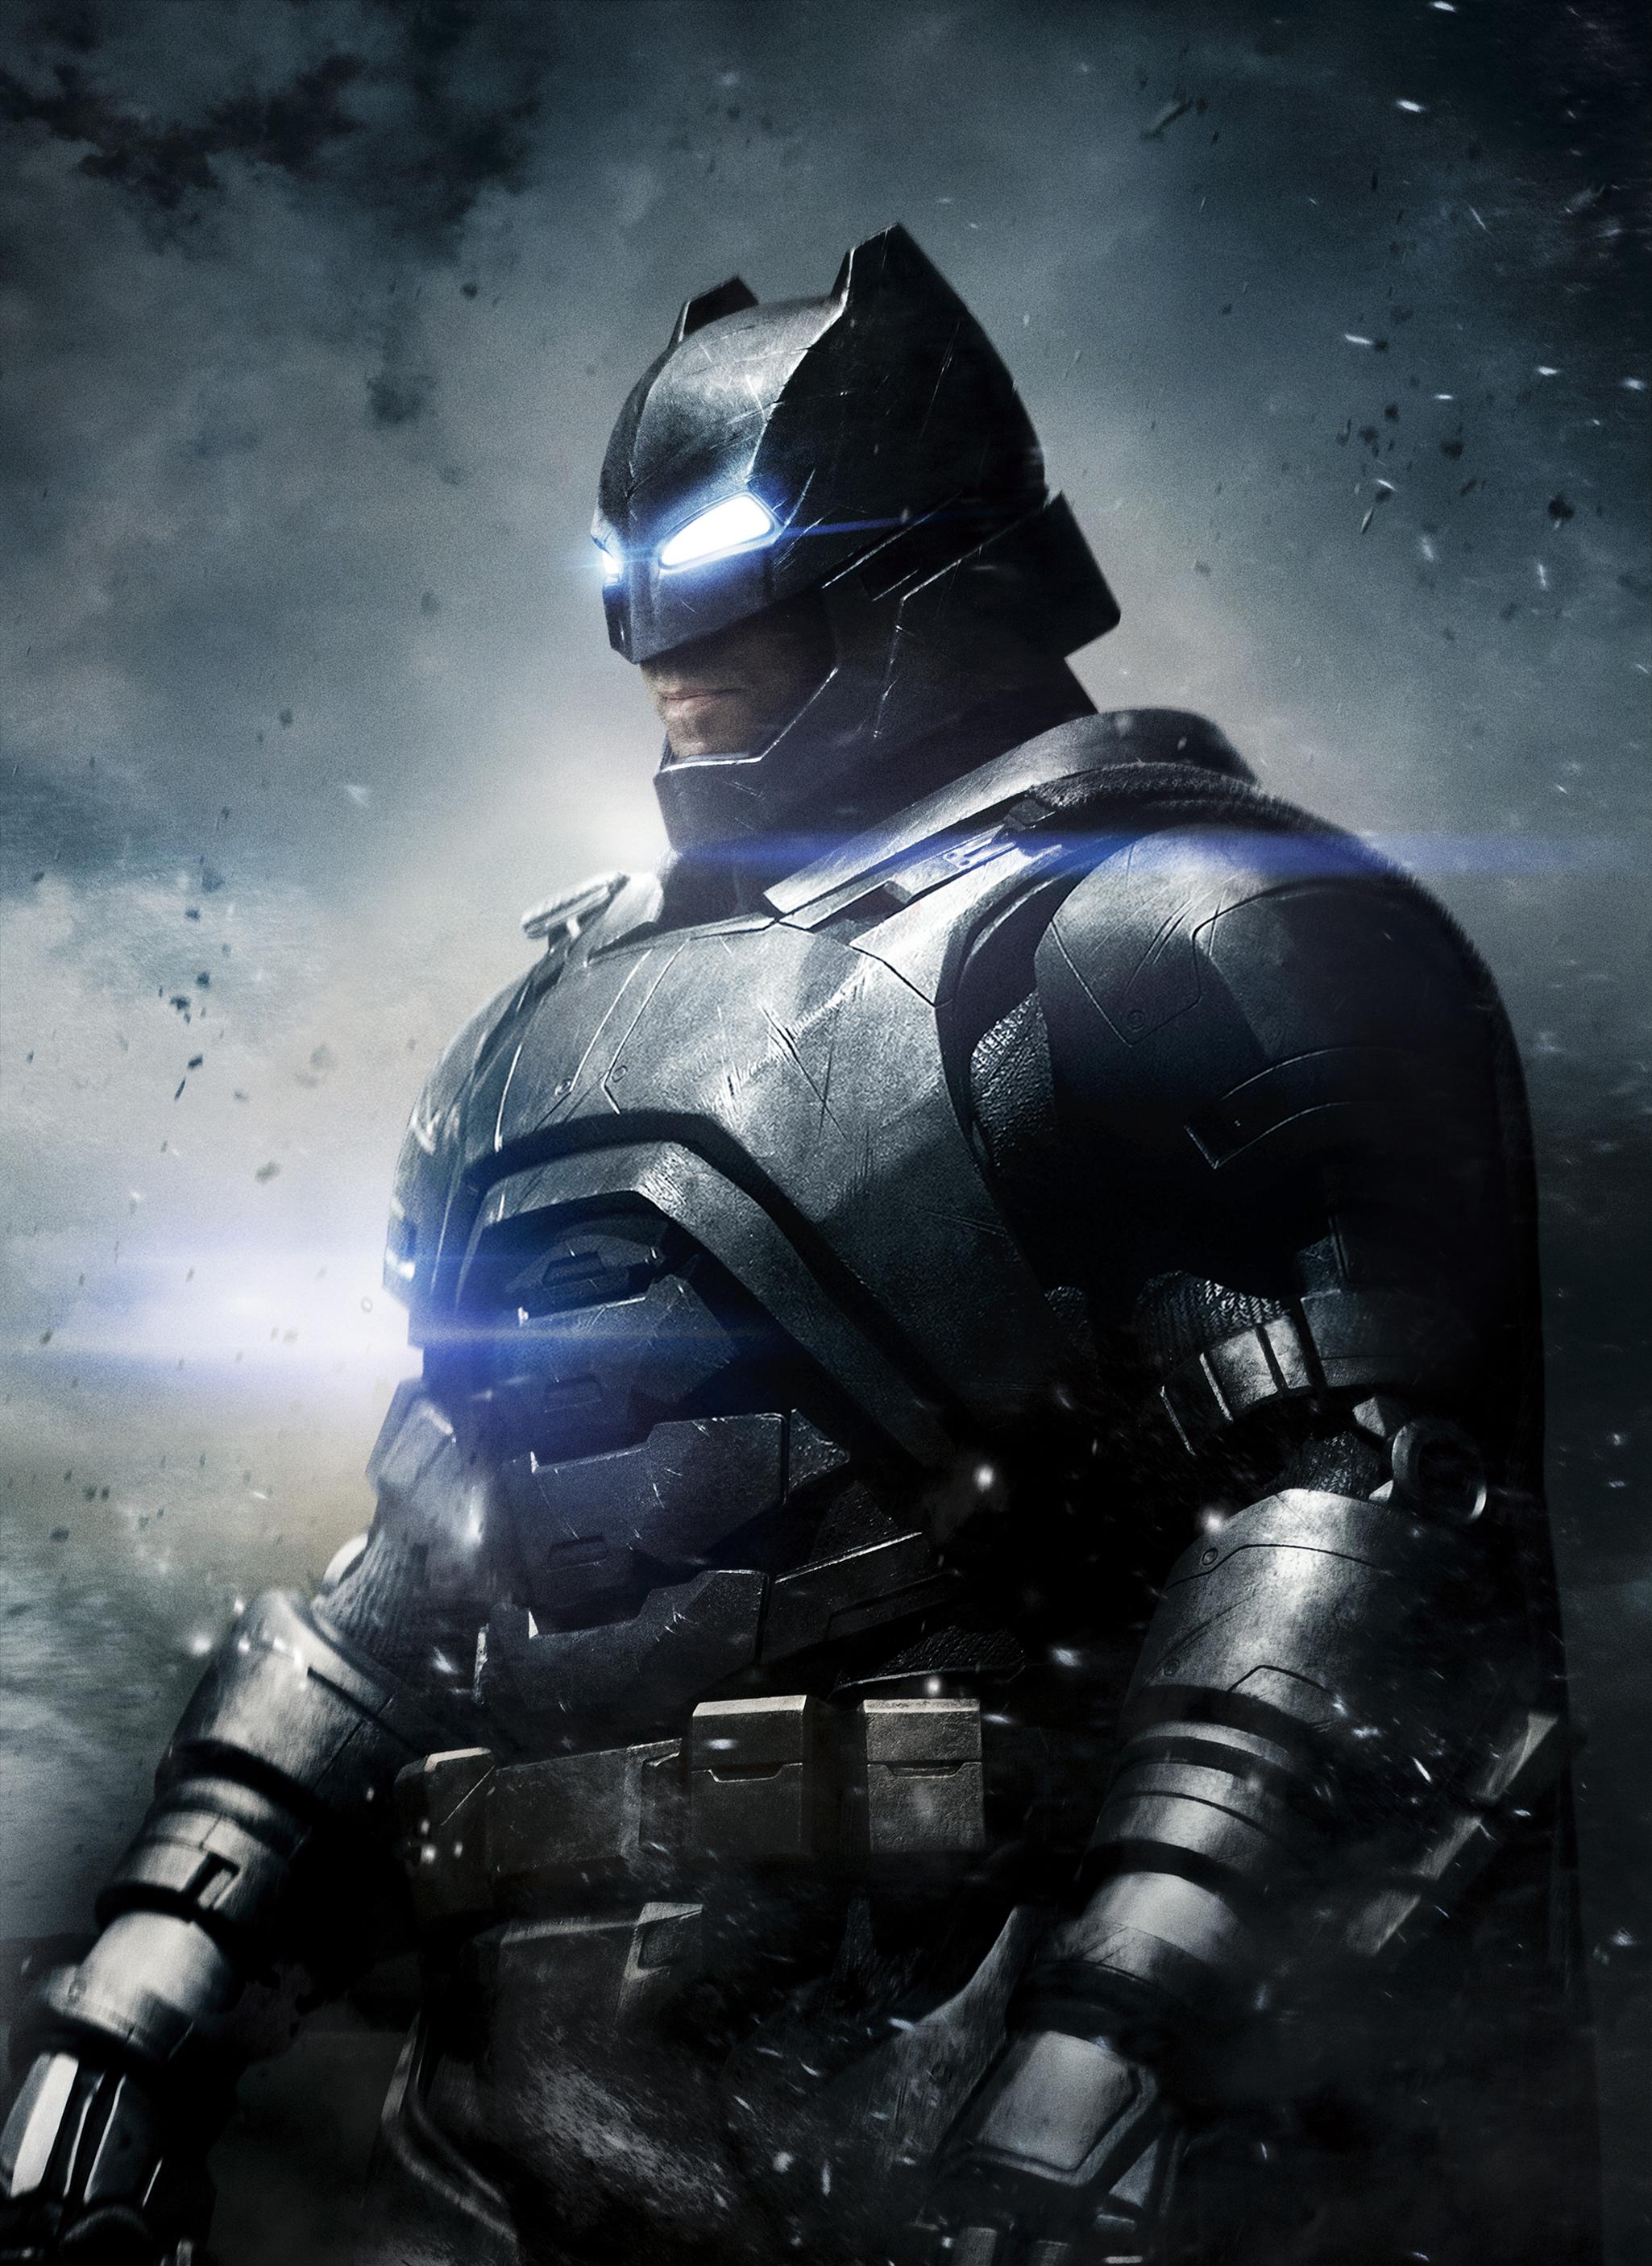 Ben Affleck Offers An Update On His Batman Solo Feature